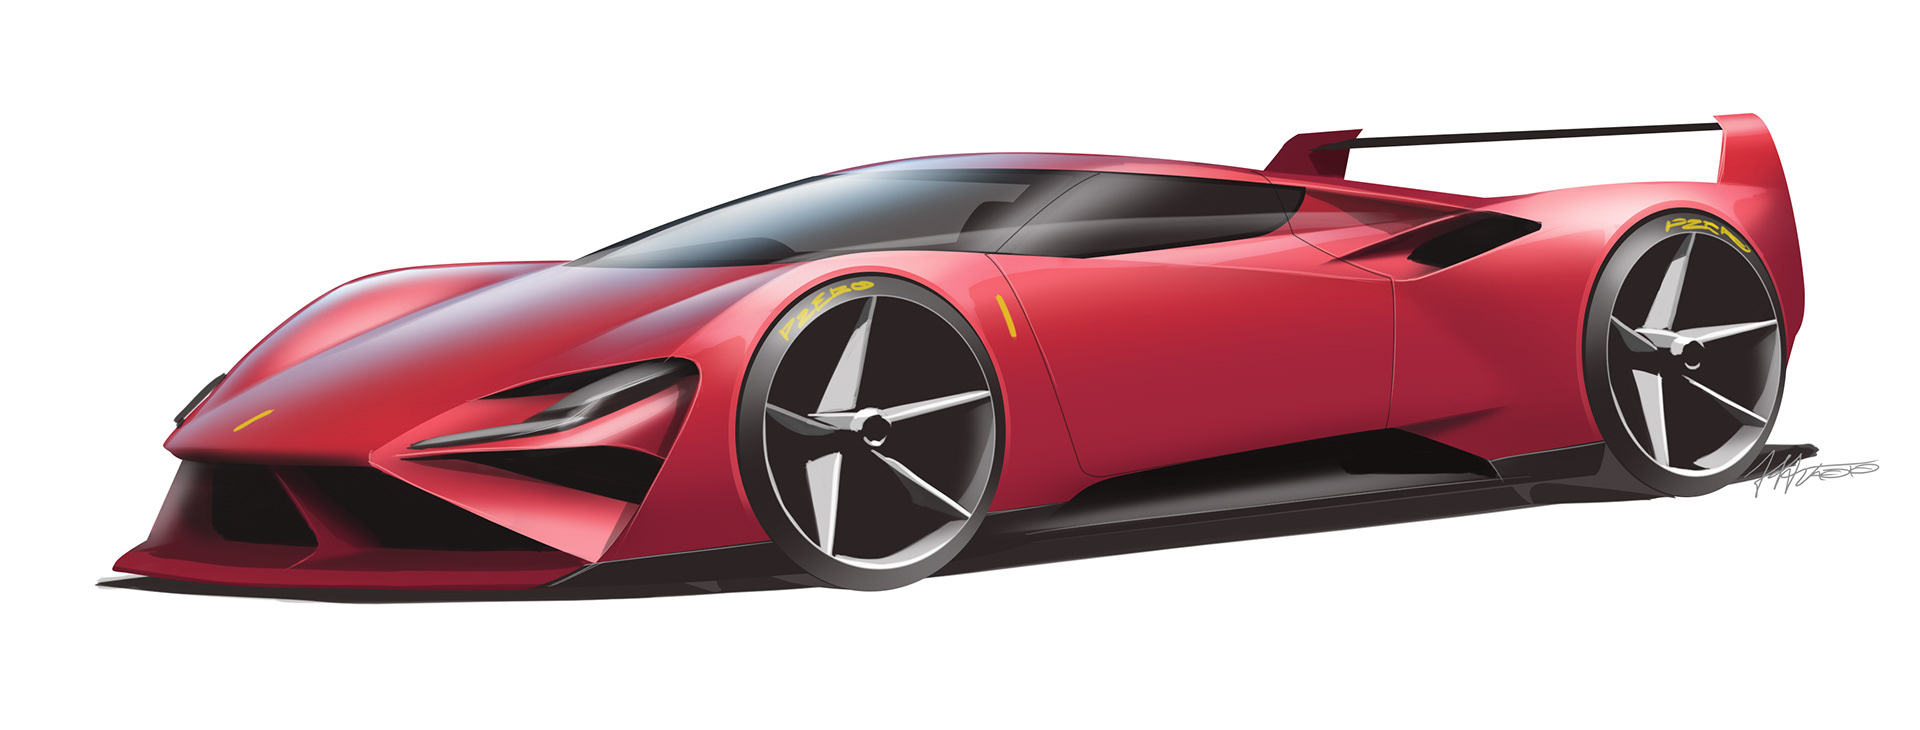 Ferrari-F40-concept-2